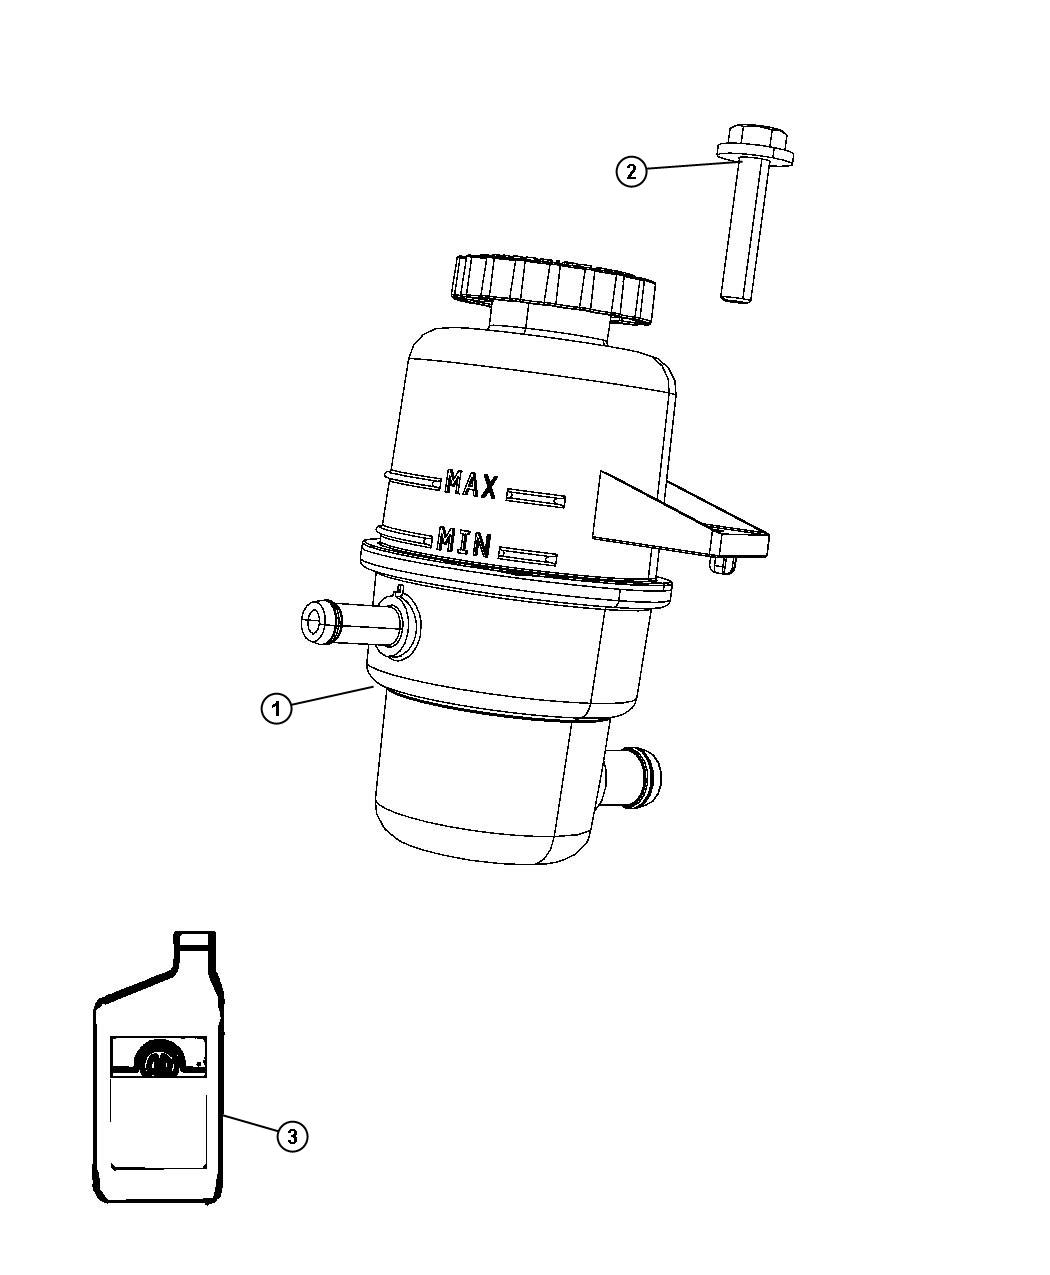 Chrysler Pacifica Fluid Power Steering Power Rack And